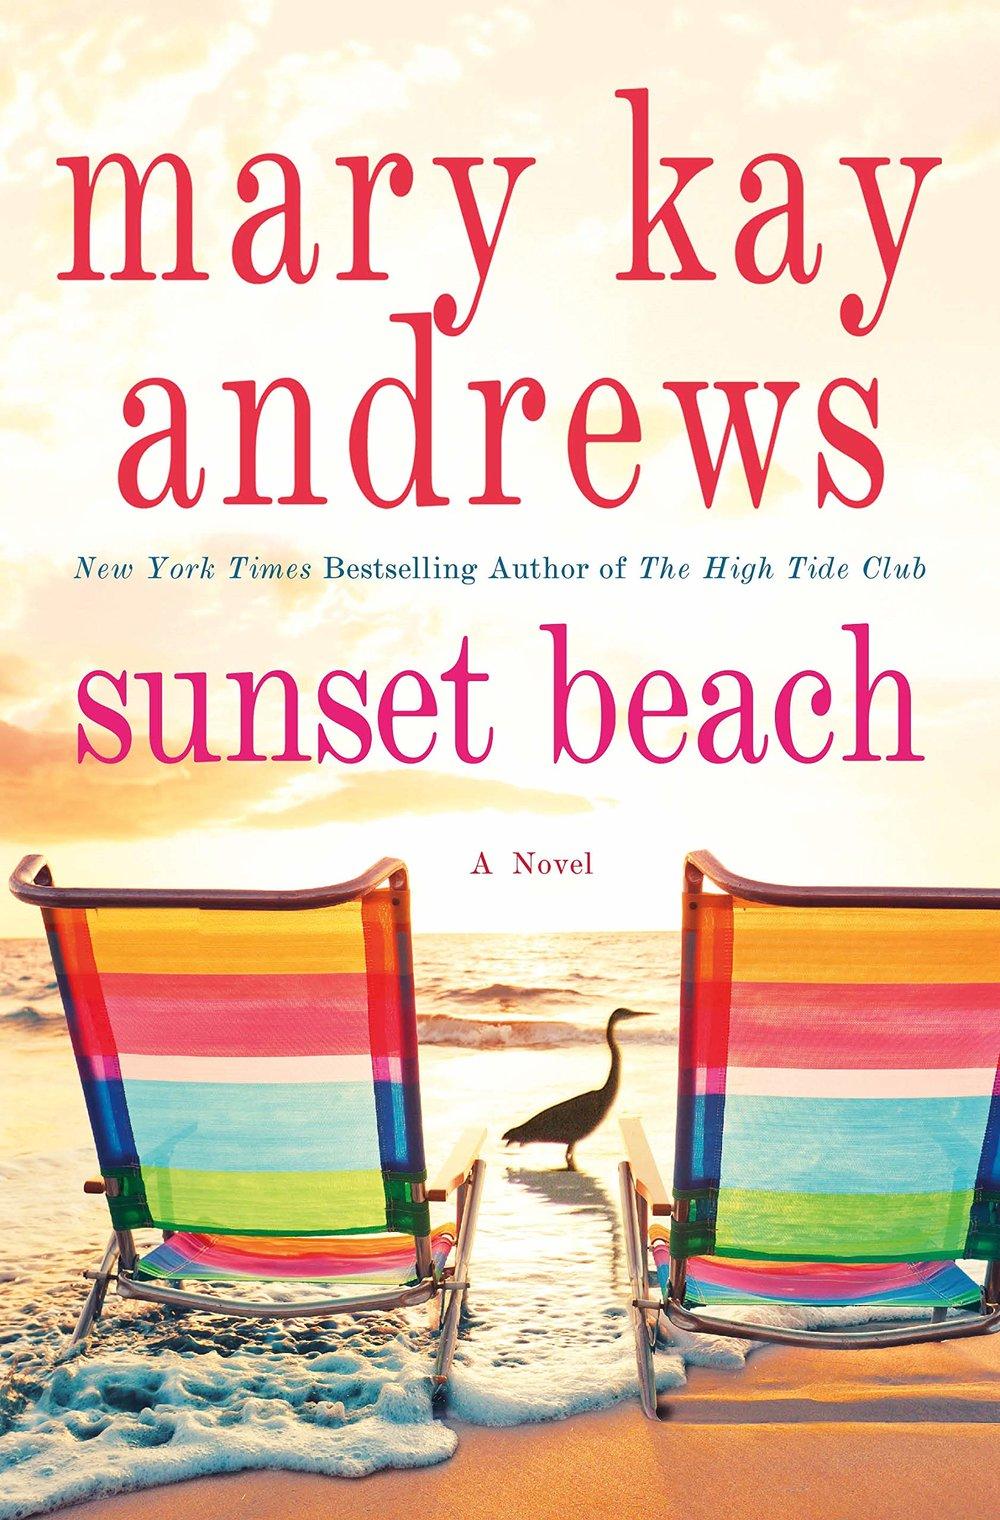 Sunset Beach - Book Review - Hasty Book List